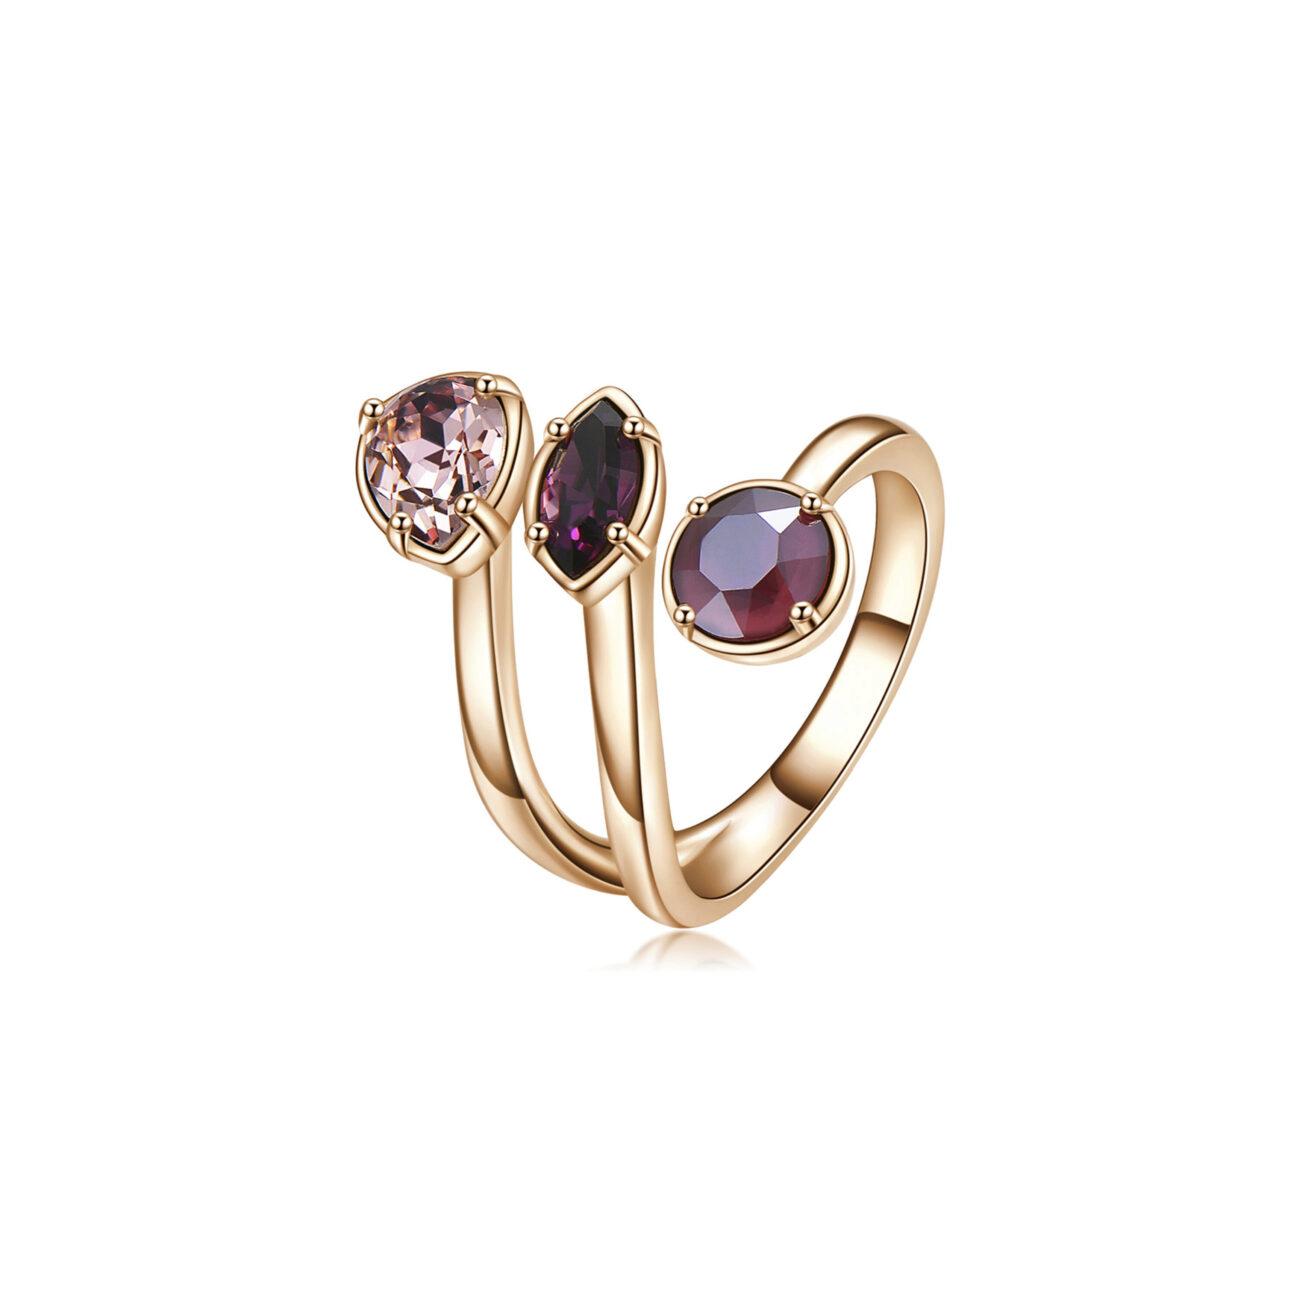 Brass ring, rose gold galvanic and antique pink, amethyst, dark red Swarovski©crystals